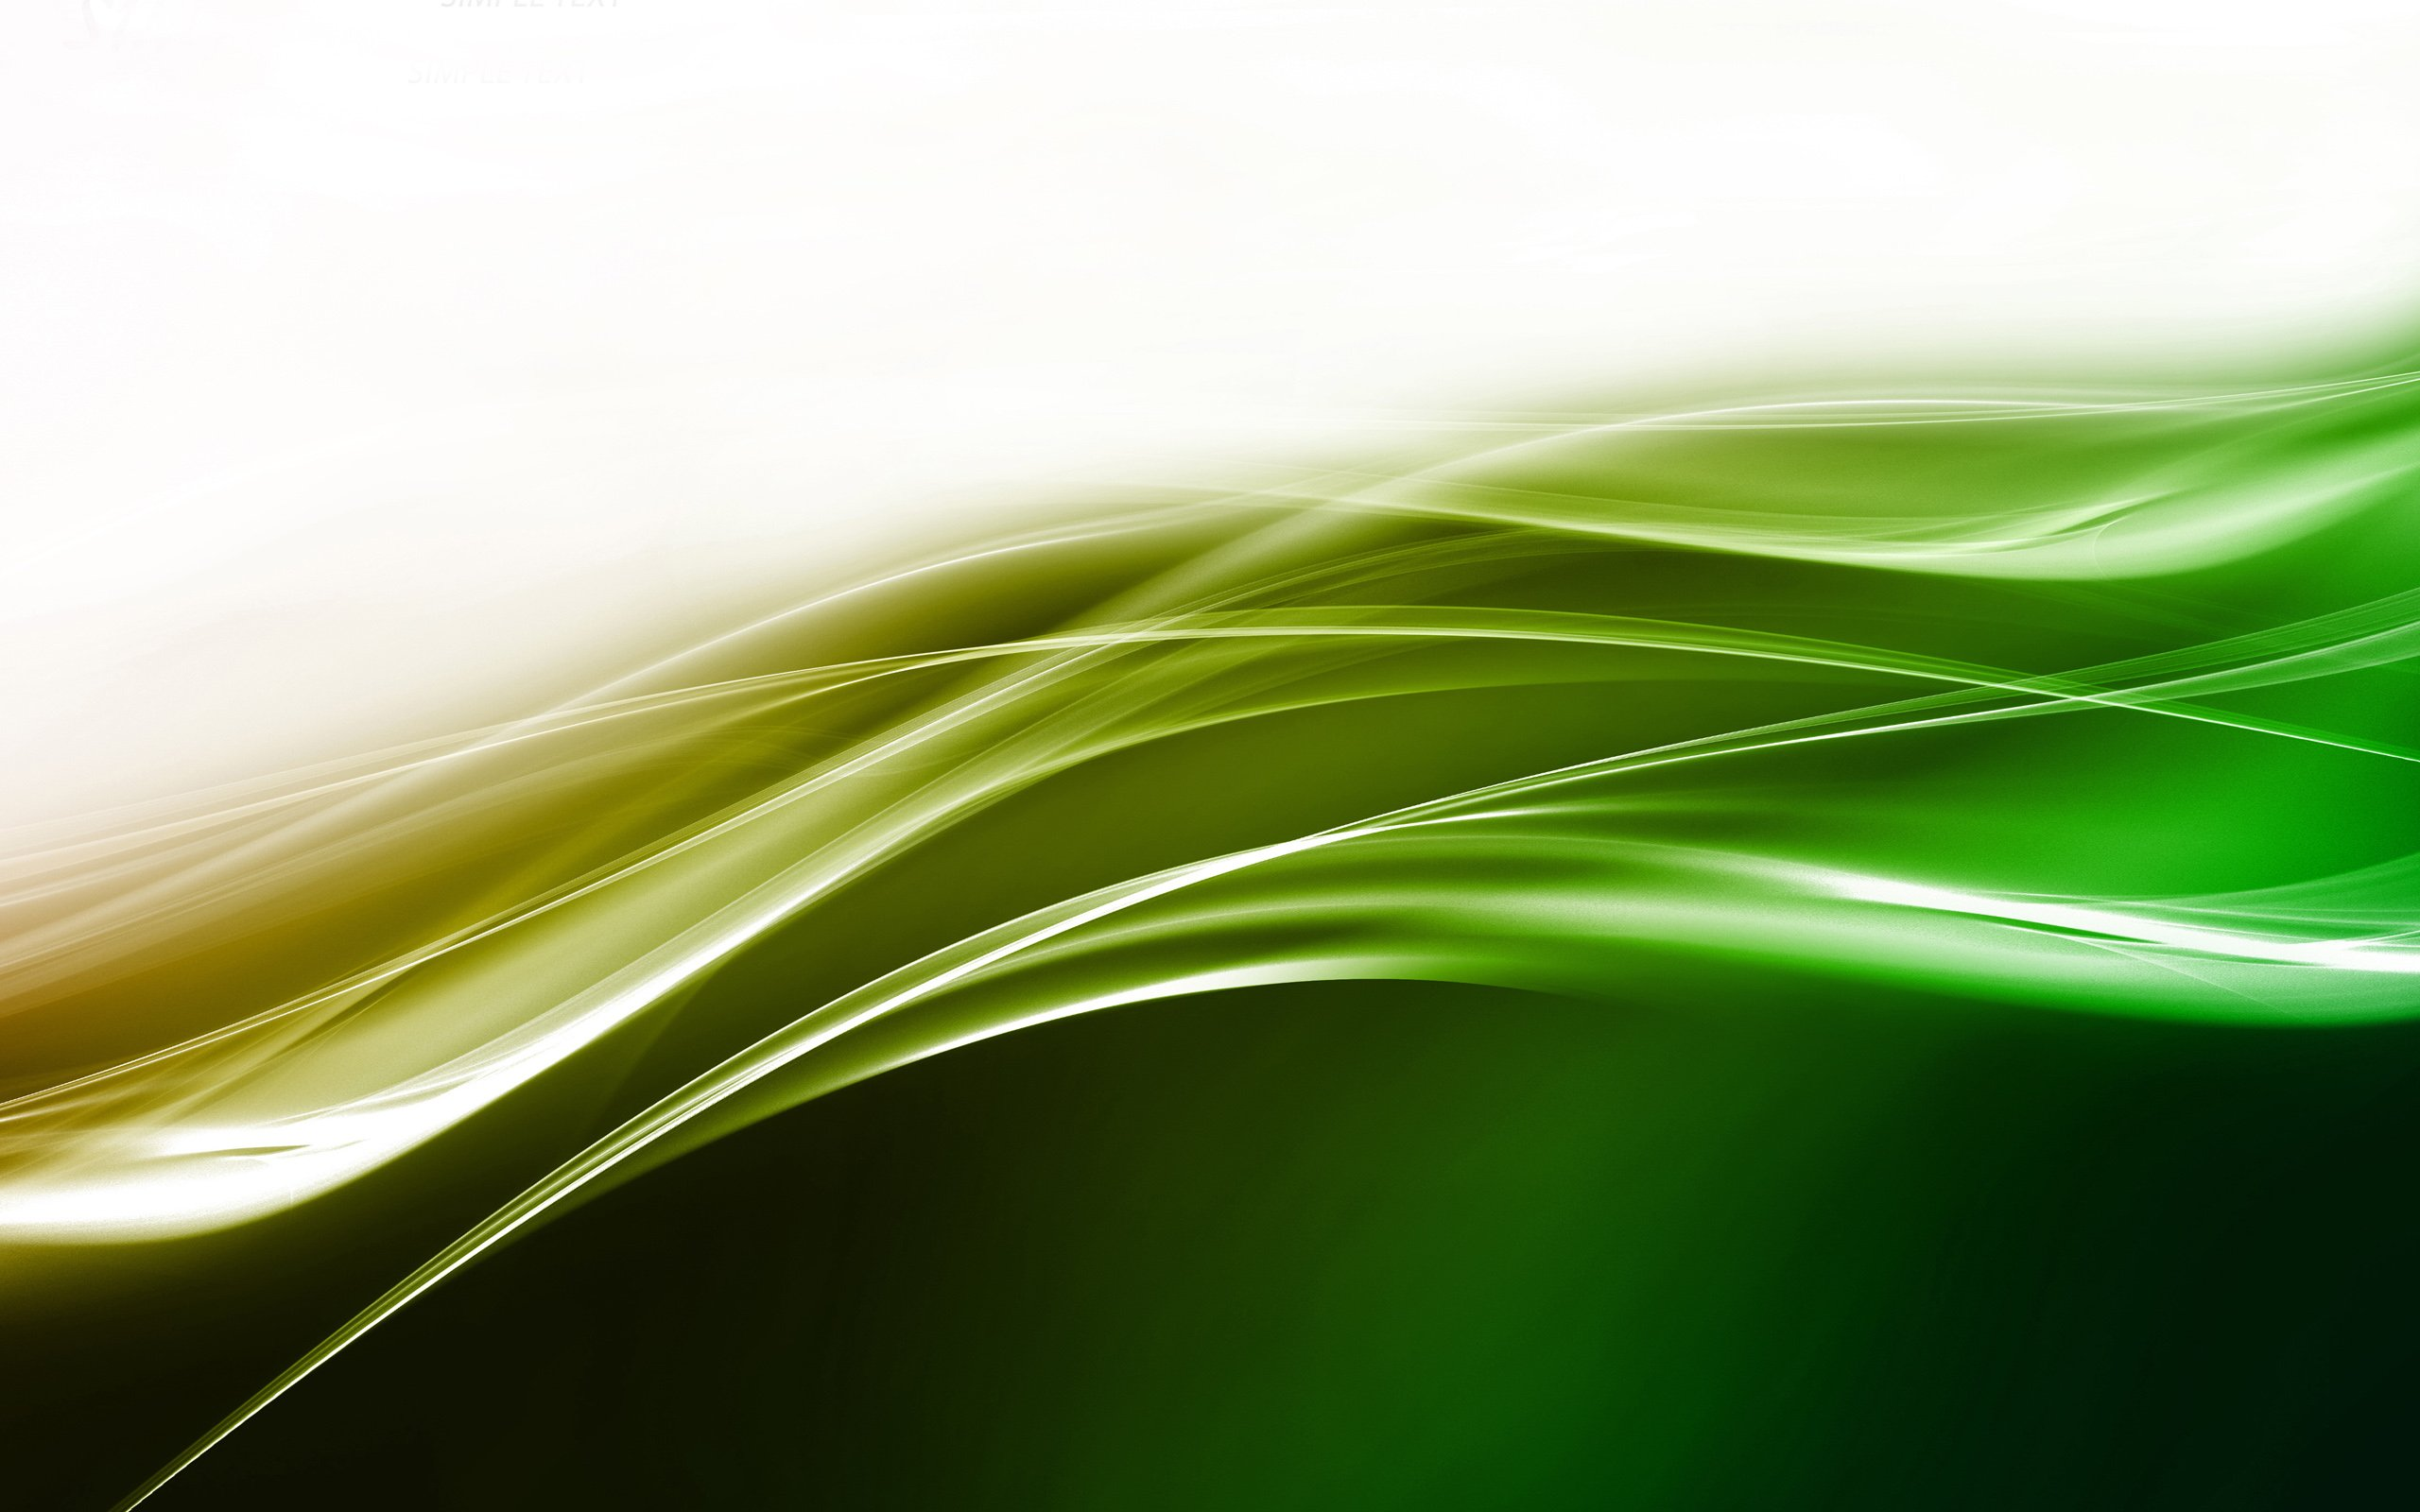 Green Abstract Design Wallpaper